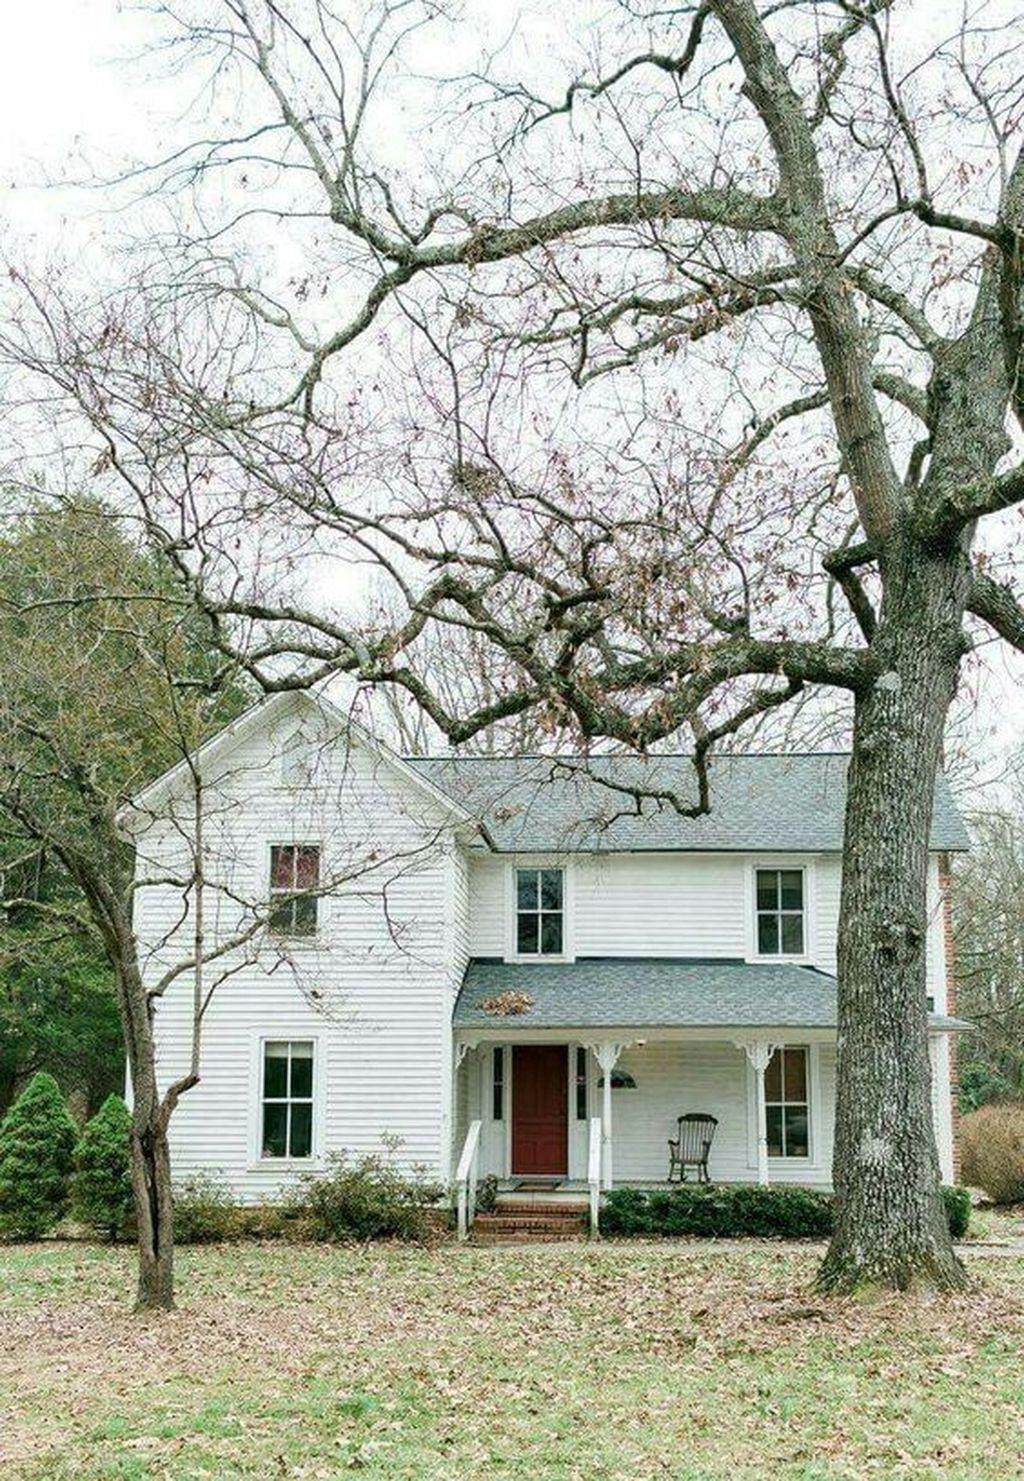 32 Stunning Colonial Farmhouse Exterior Design Ideas Farmhouse Exterior Colonial Farmhouse Old Farm Houses